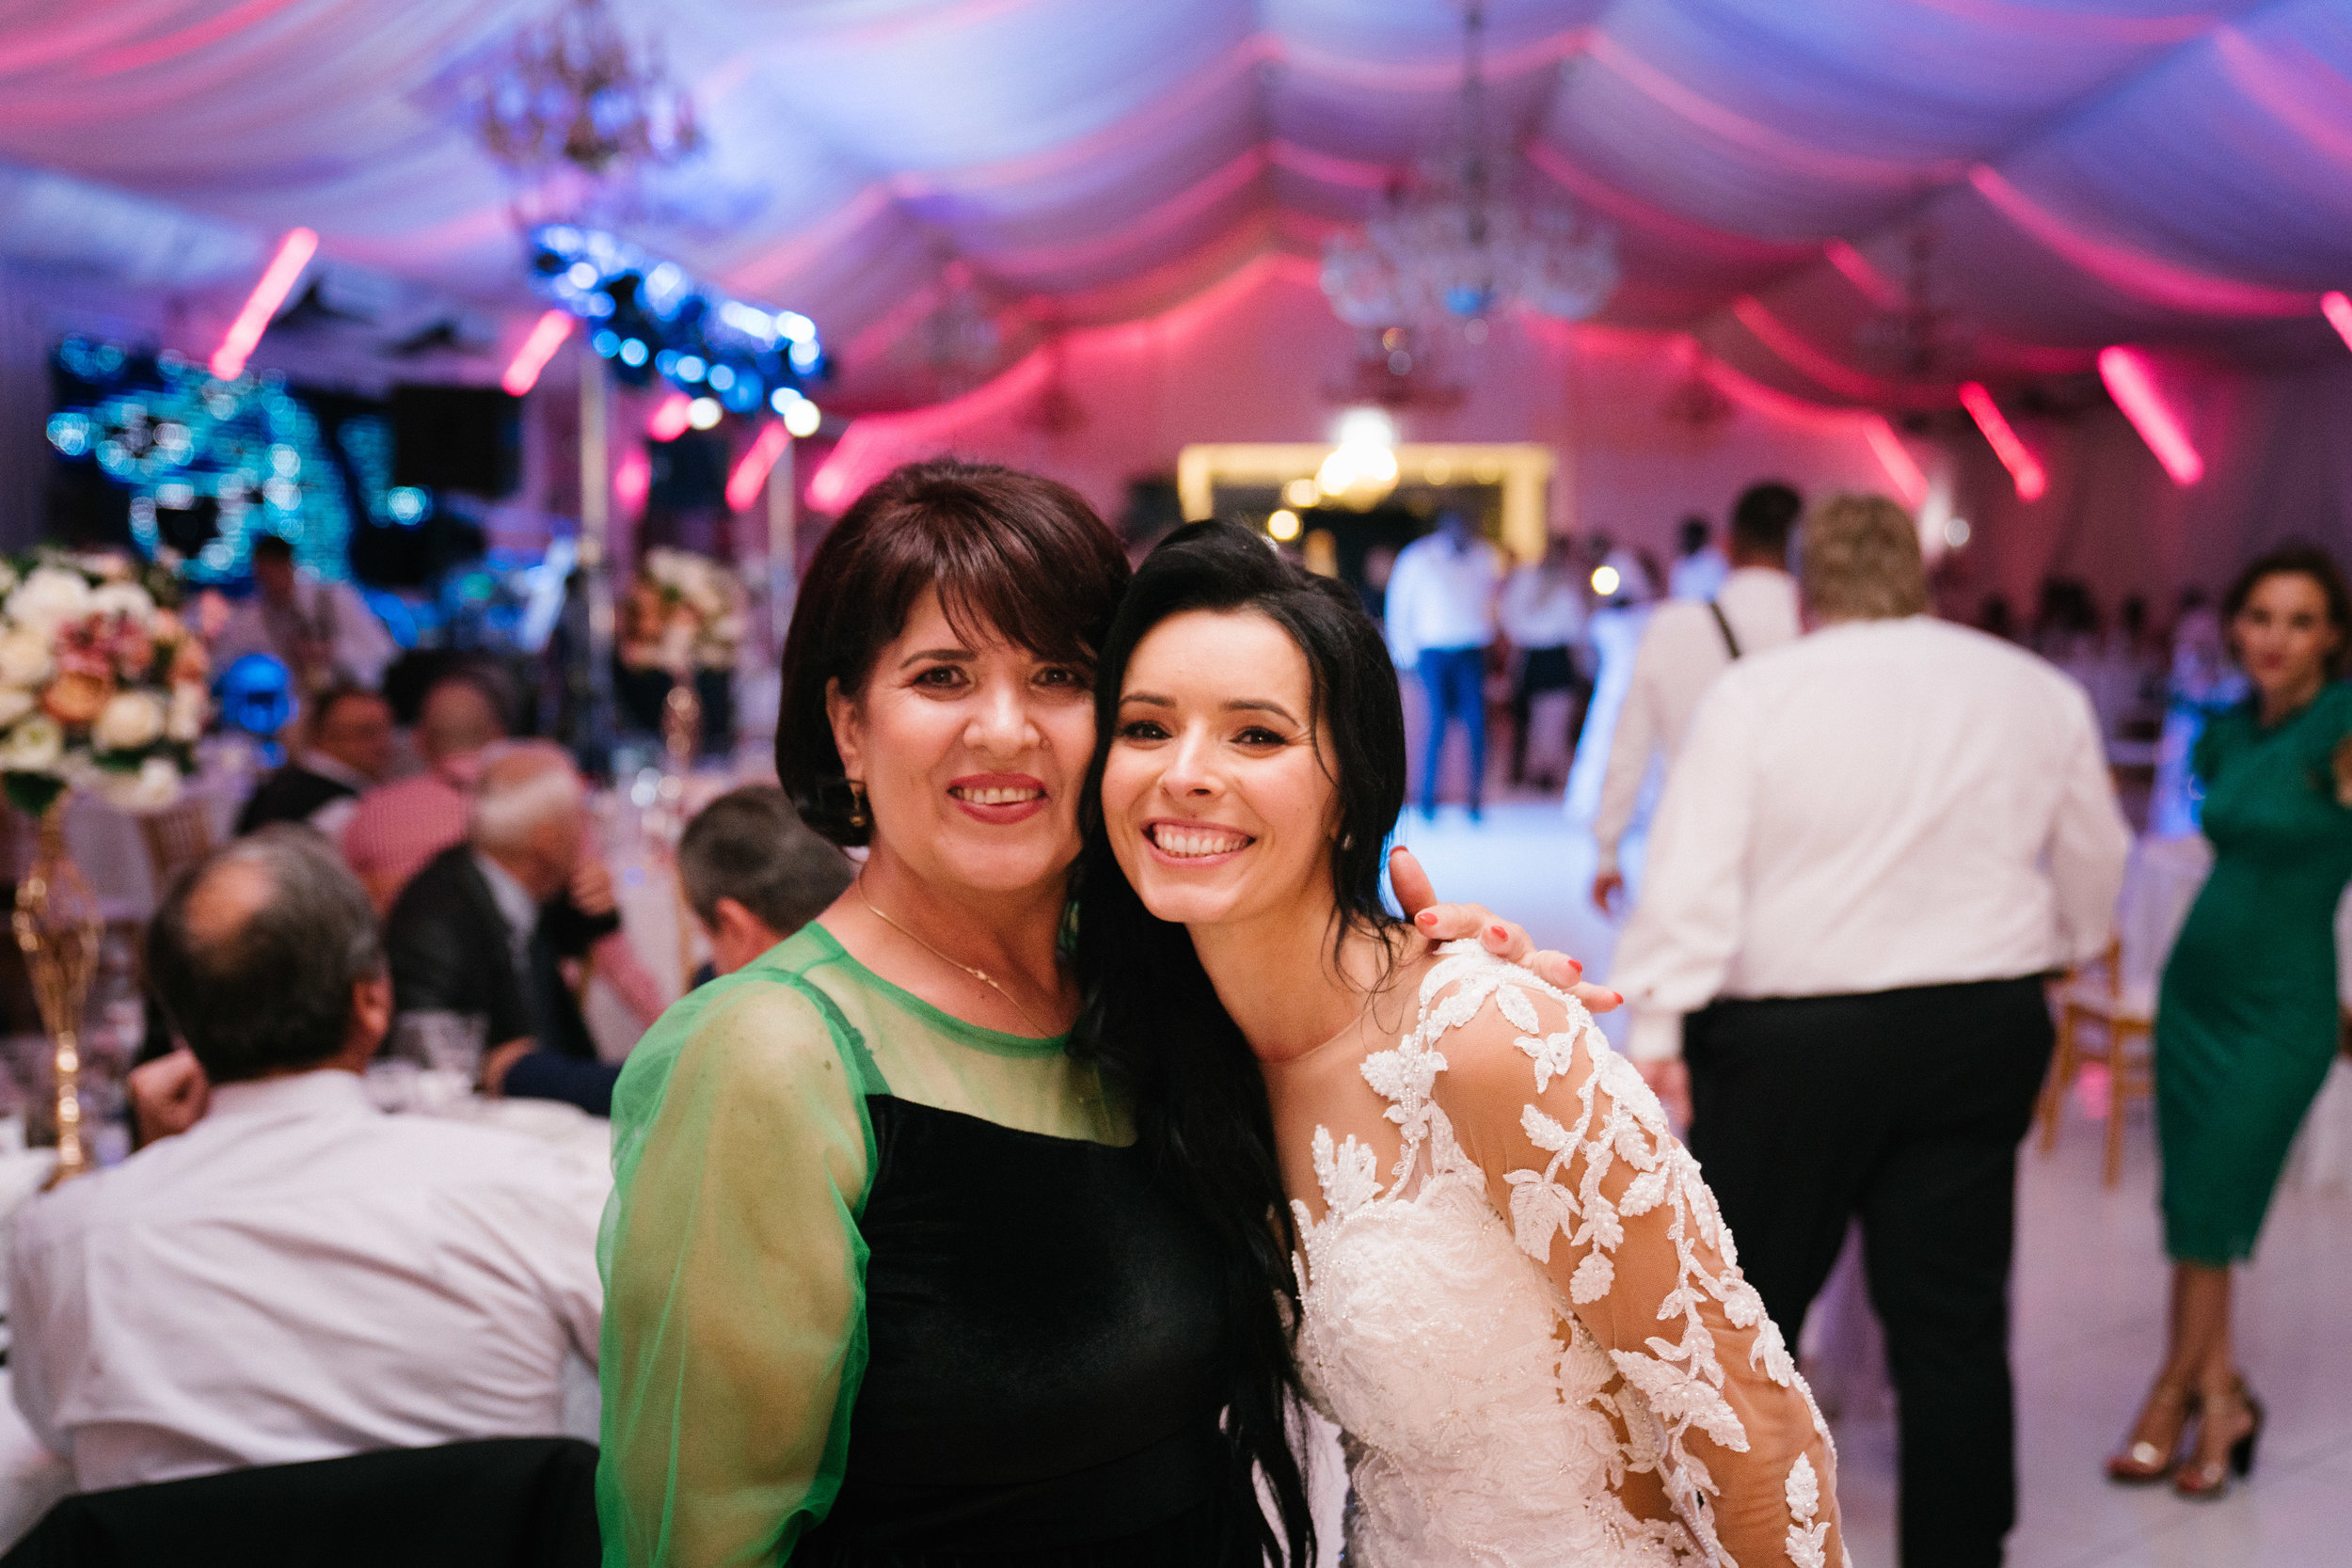 london-romania-destination-wedding-photographer-videographer-126